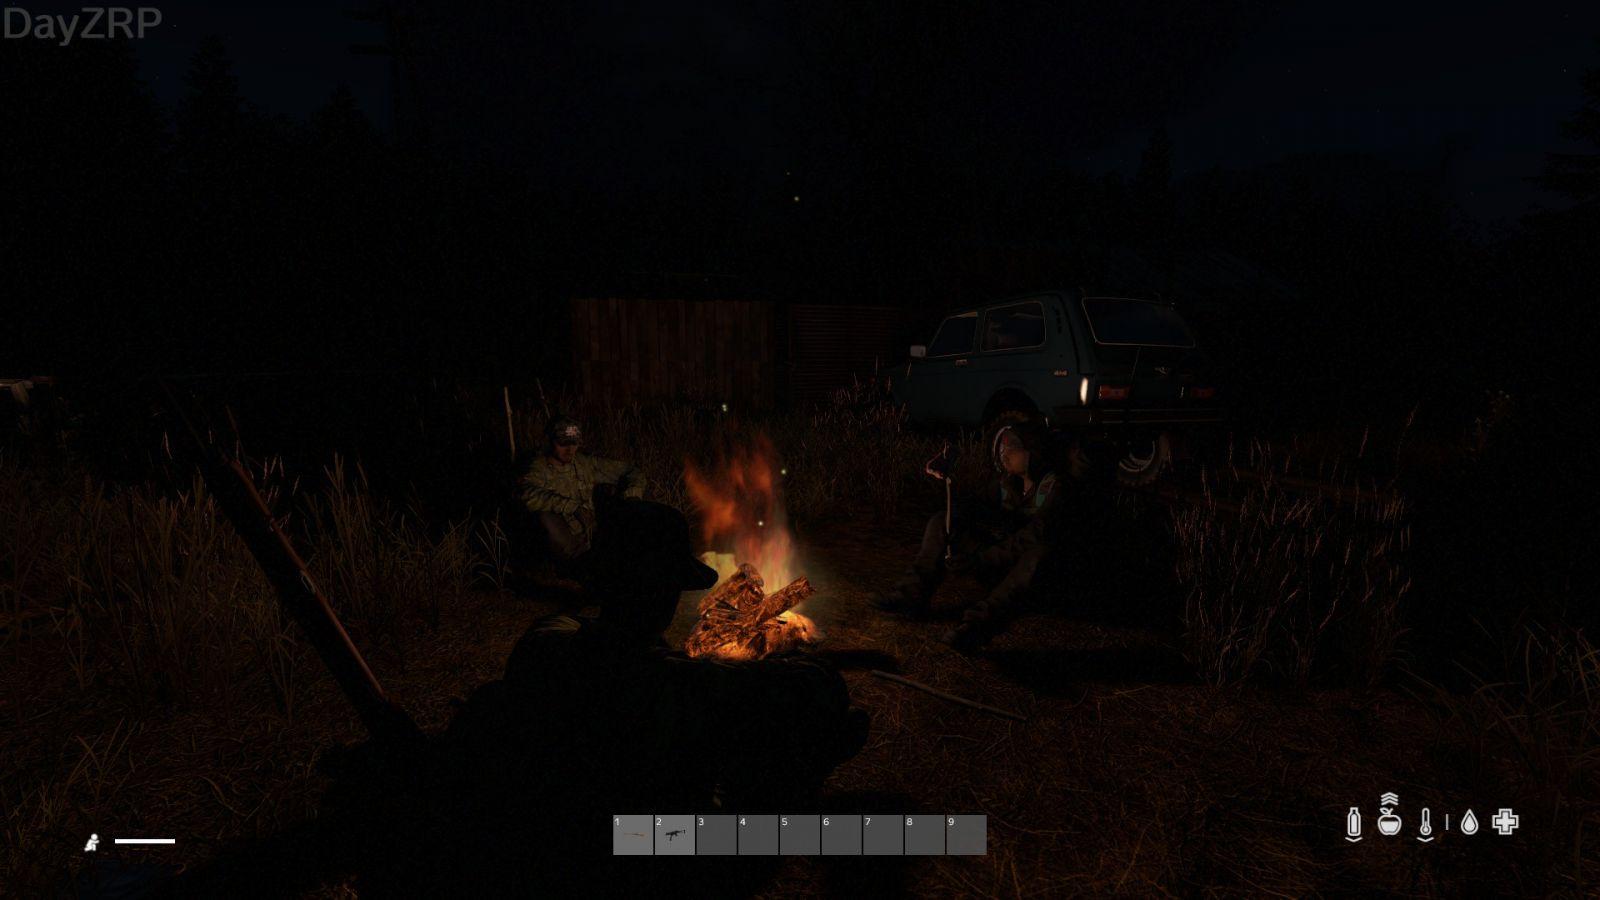 Nice gathering around the fire